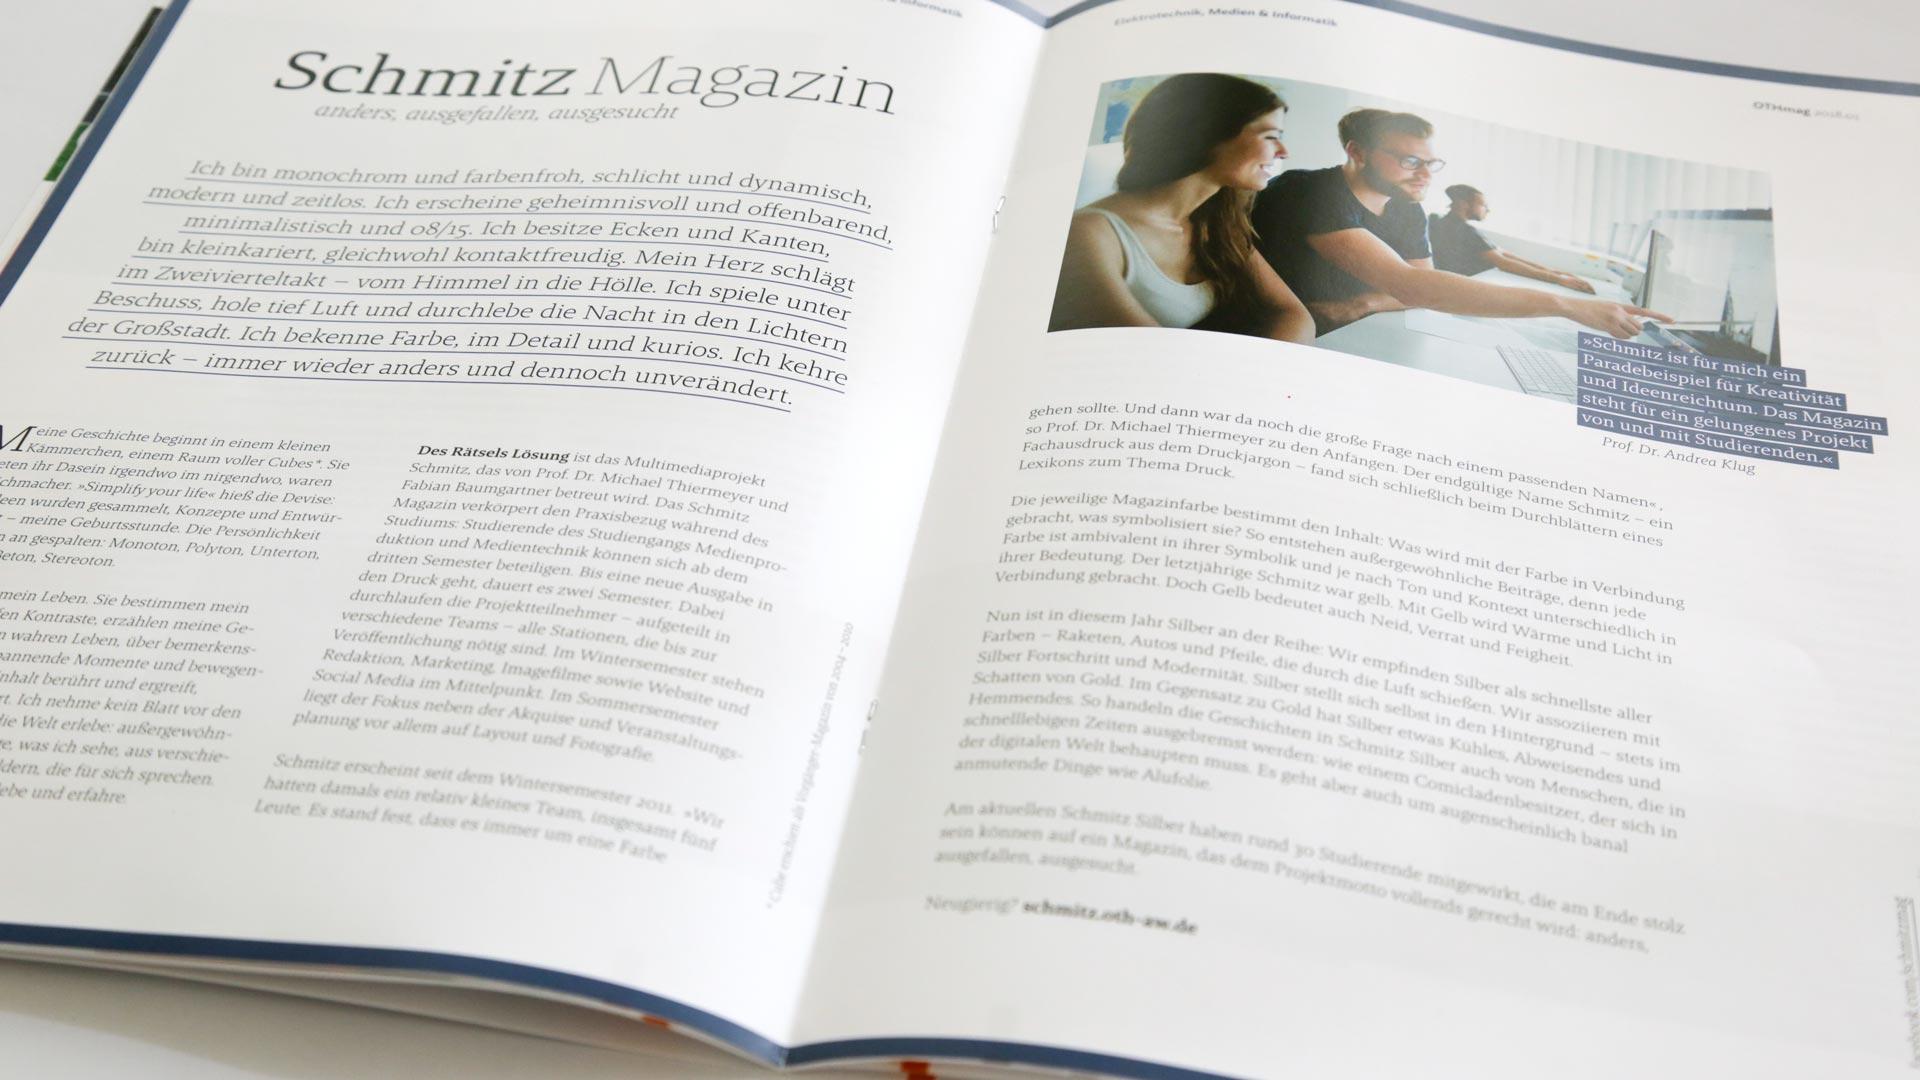 othschmitzmagazin_09 | Schmitz